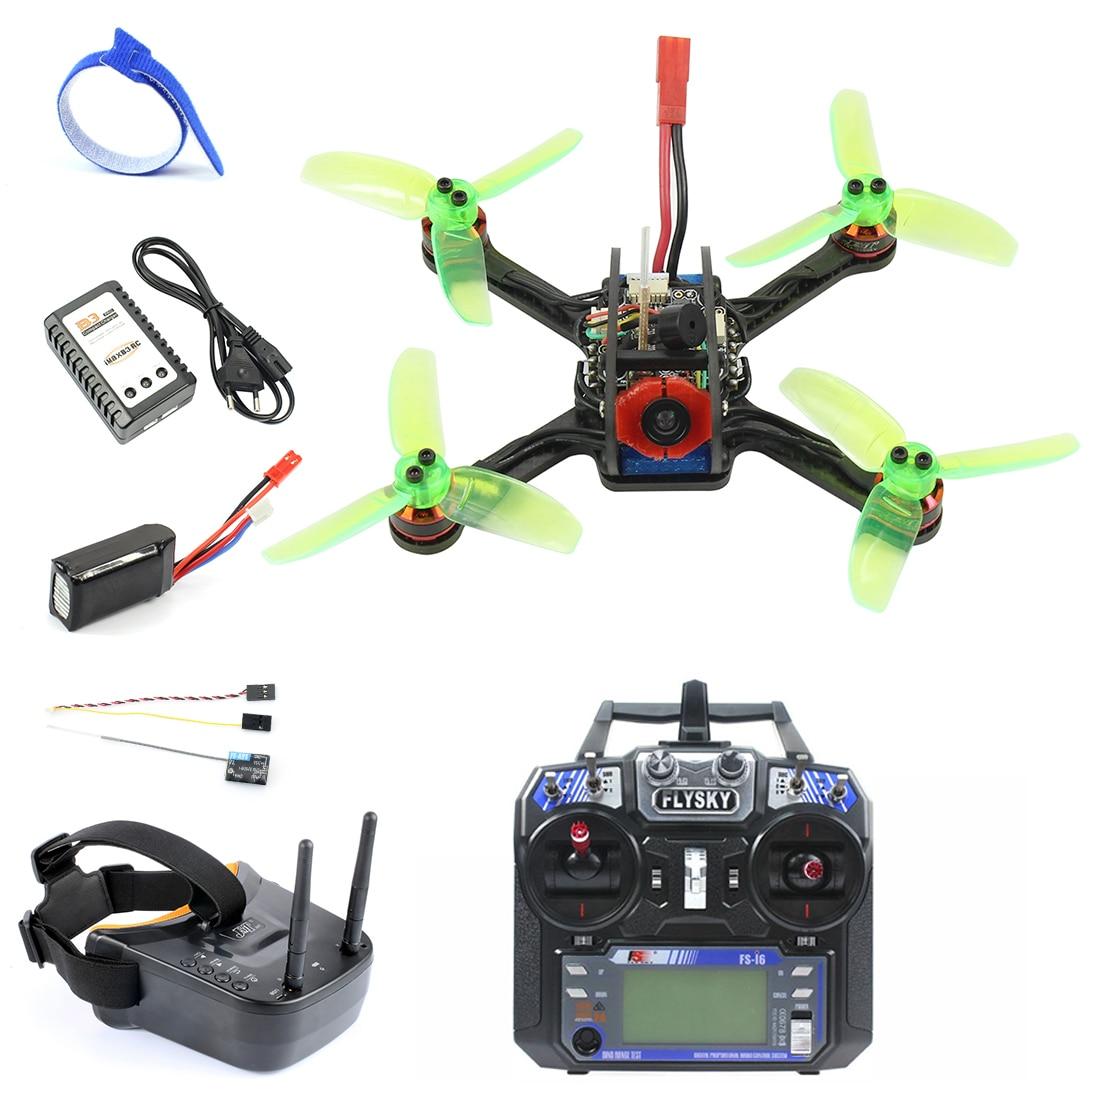 Mini 120mm F3 OSD 2S RC FPV Racing Drone Quadcopter 700TVL Camera VTX Goggle 10A ESC 7500KV Brushless 2.4G 6ch BNF RTF Set